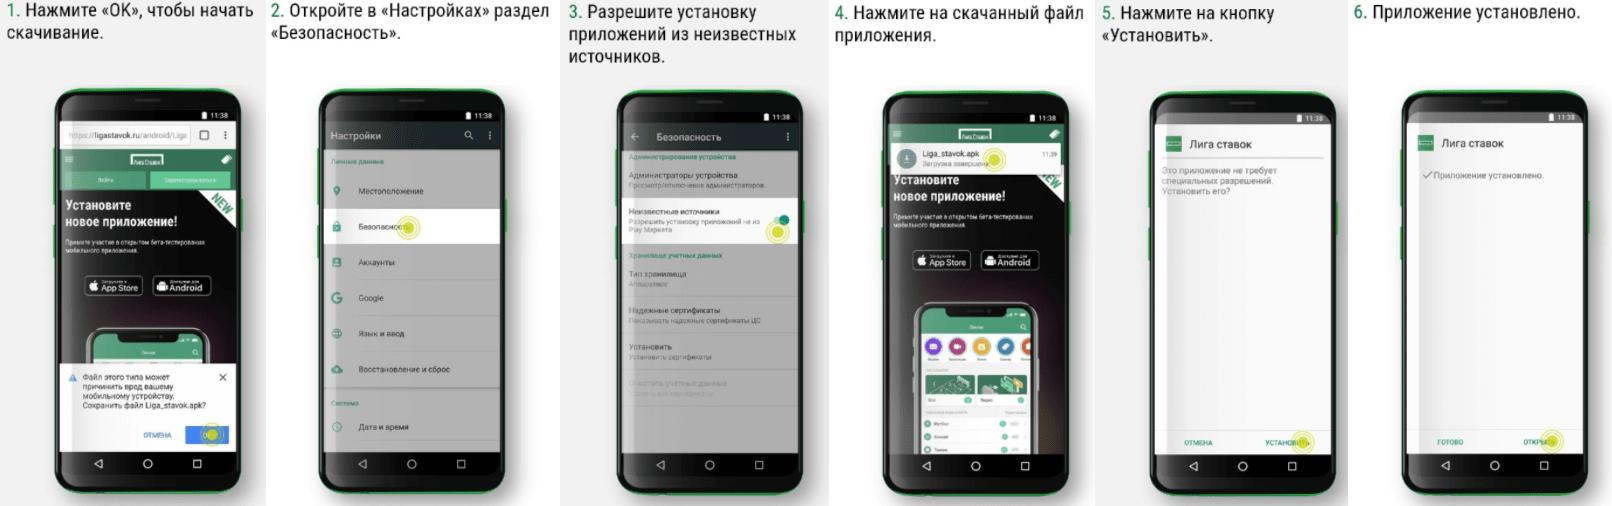 Обзор приложения БК Лига Ставок на Android